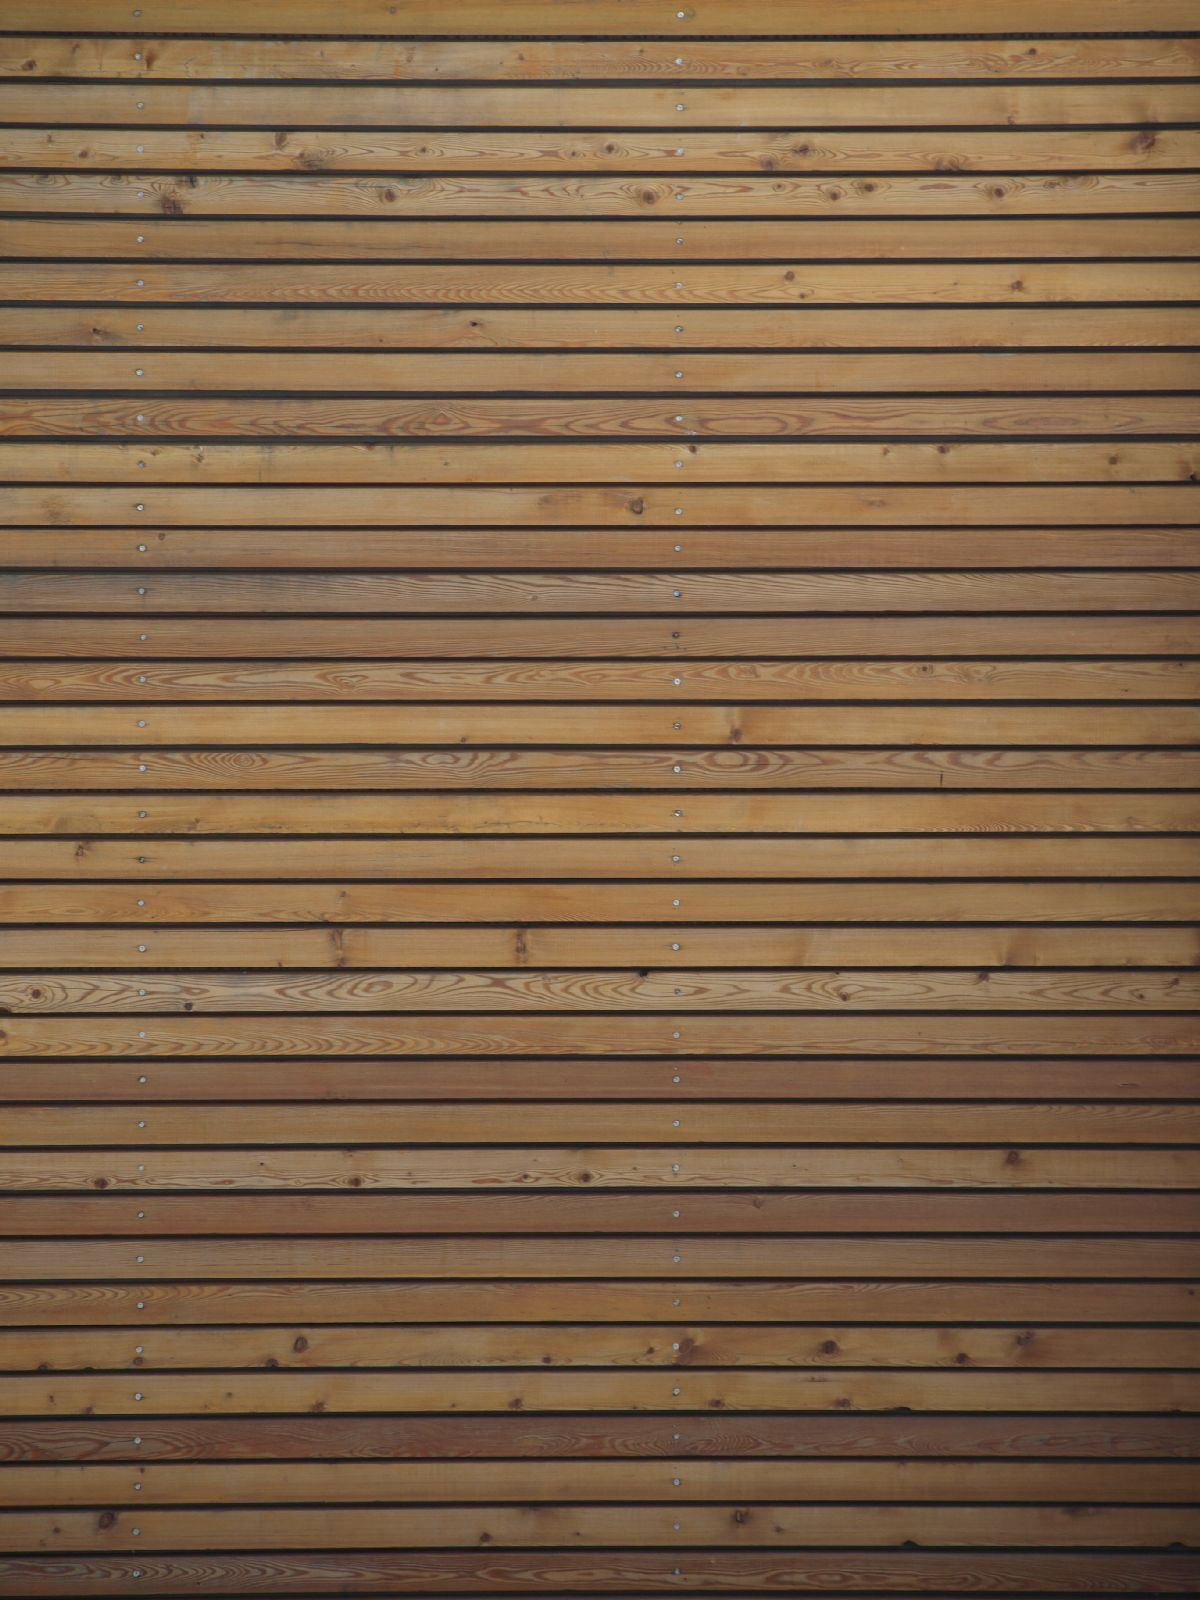 Wood_Texture_A_P9269855